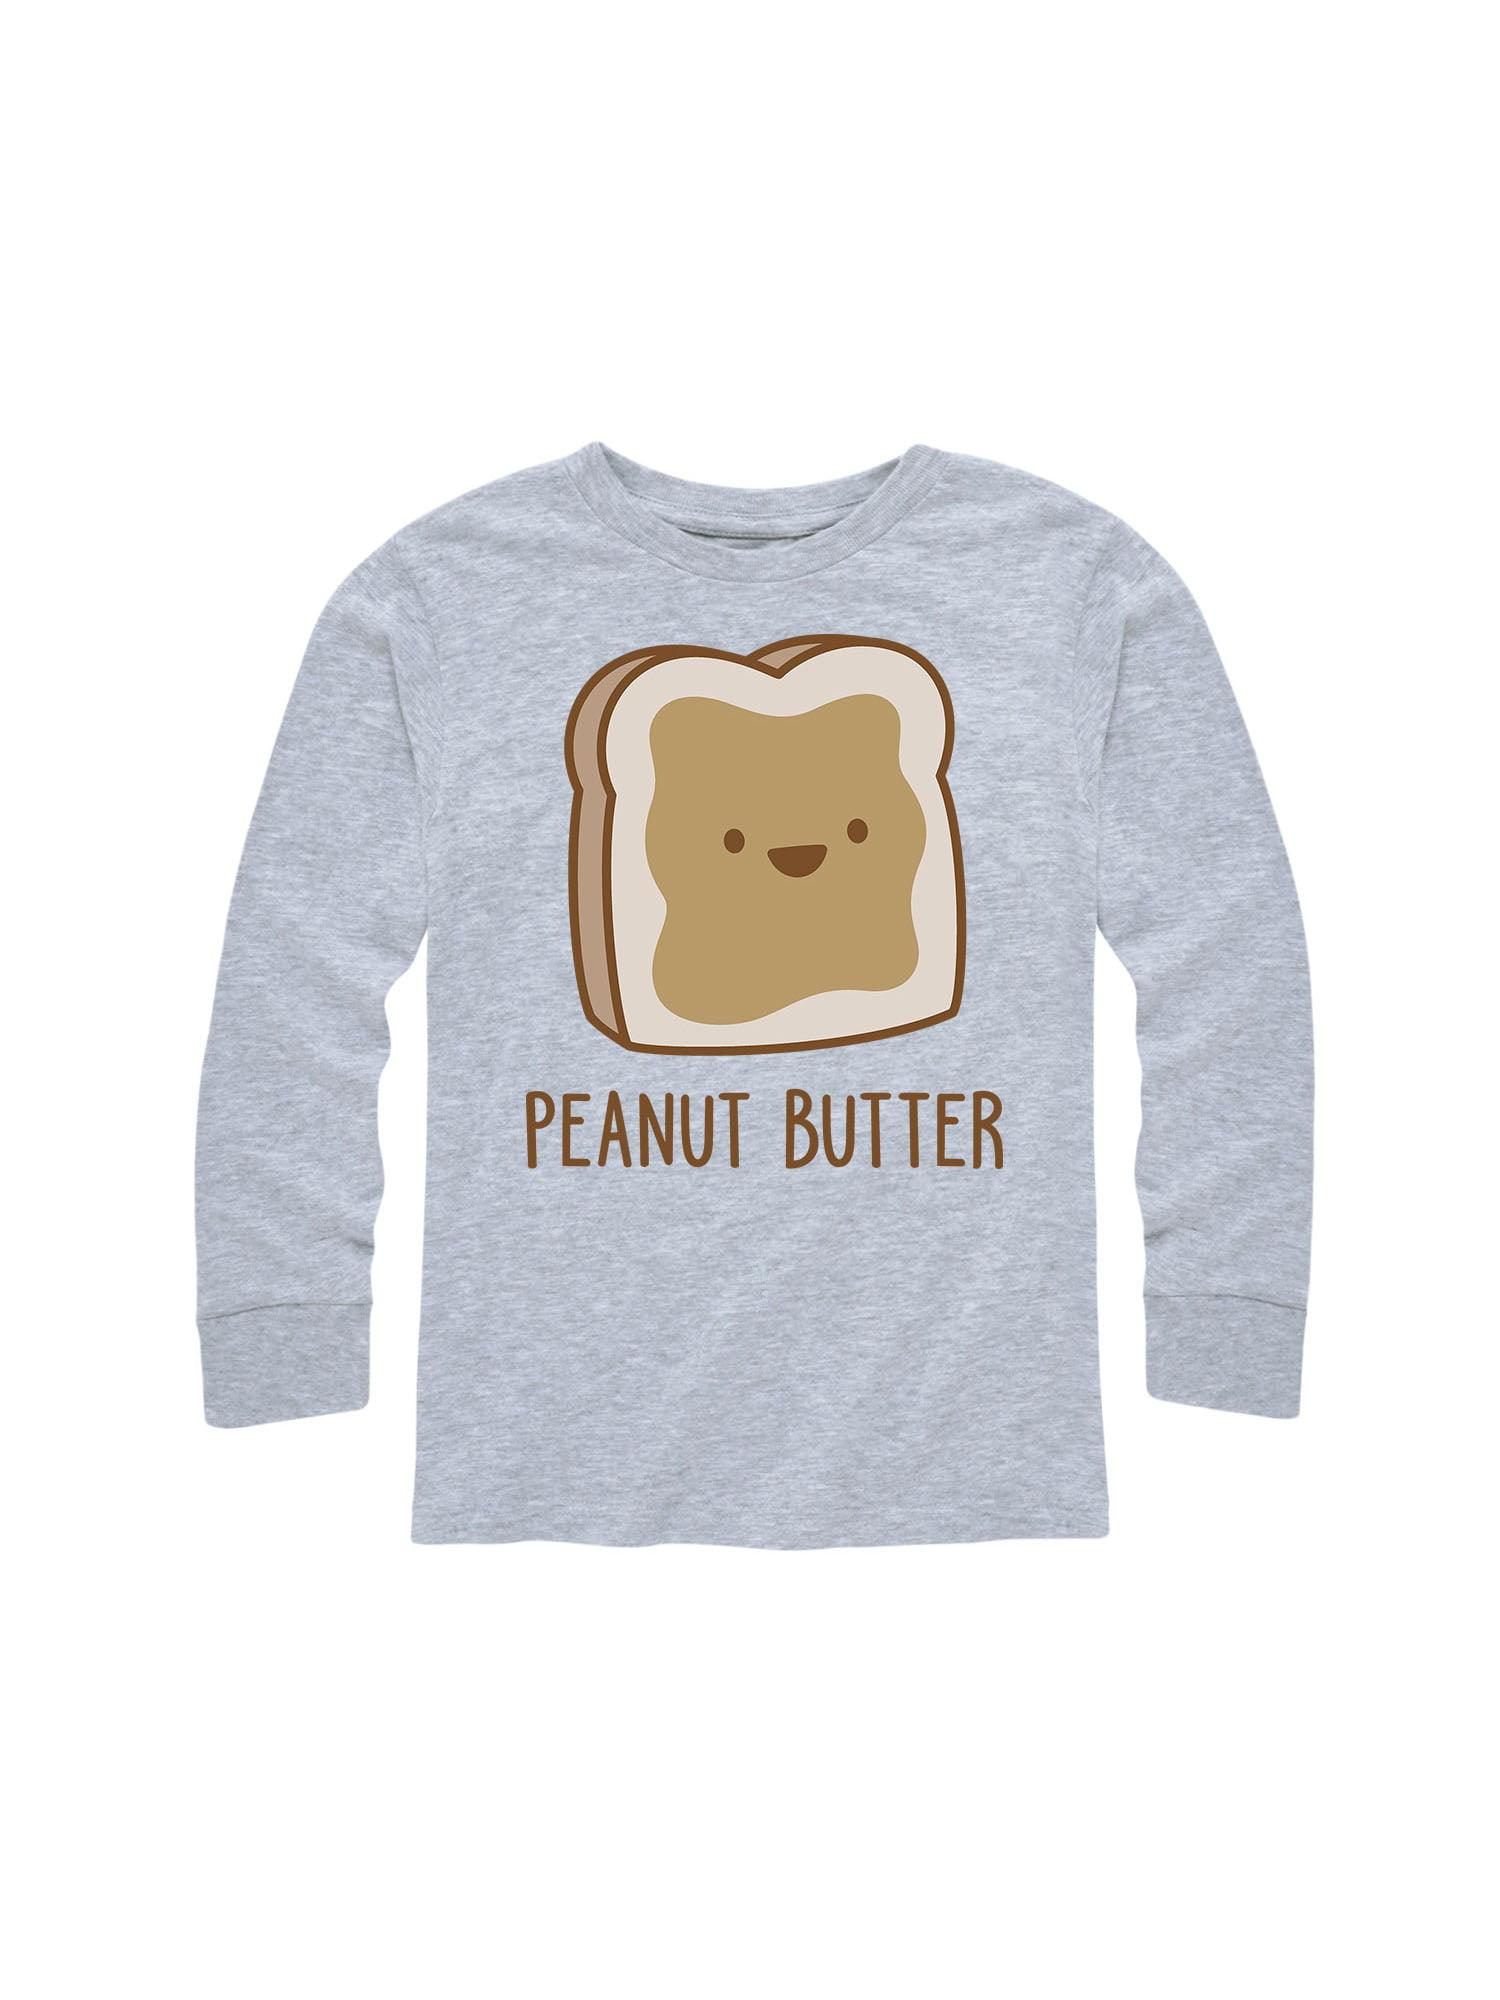 Twins Peanut Butter  - Toddler Long Sleeve Tee